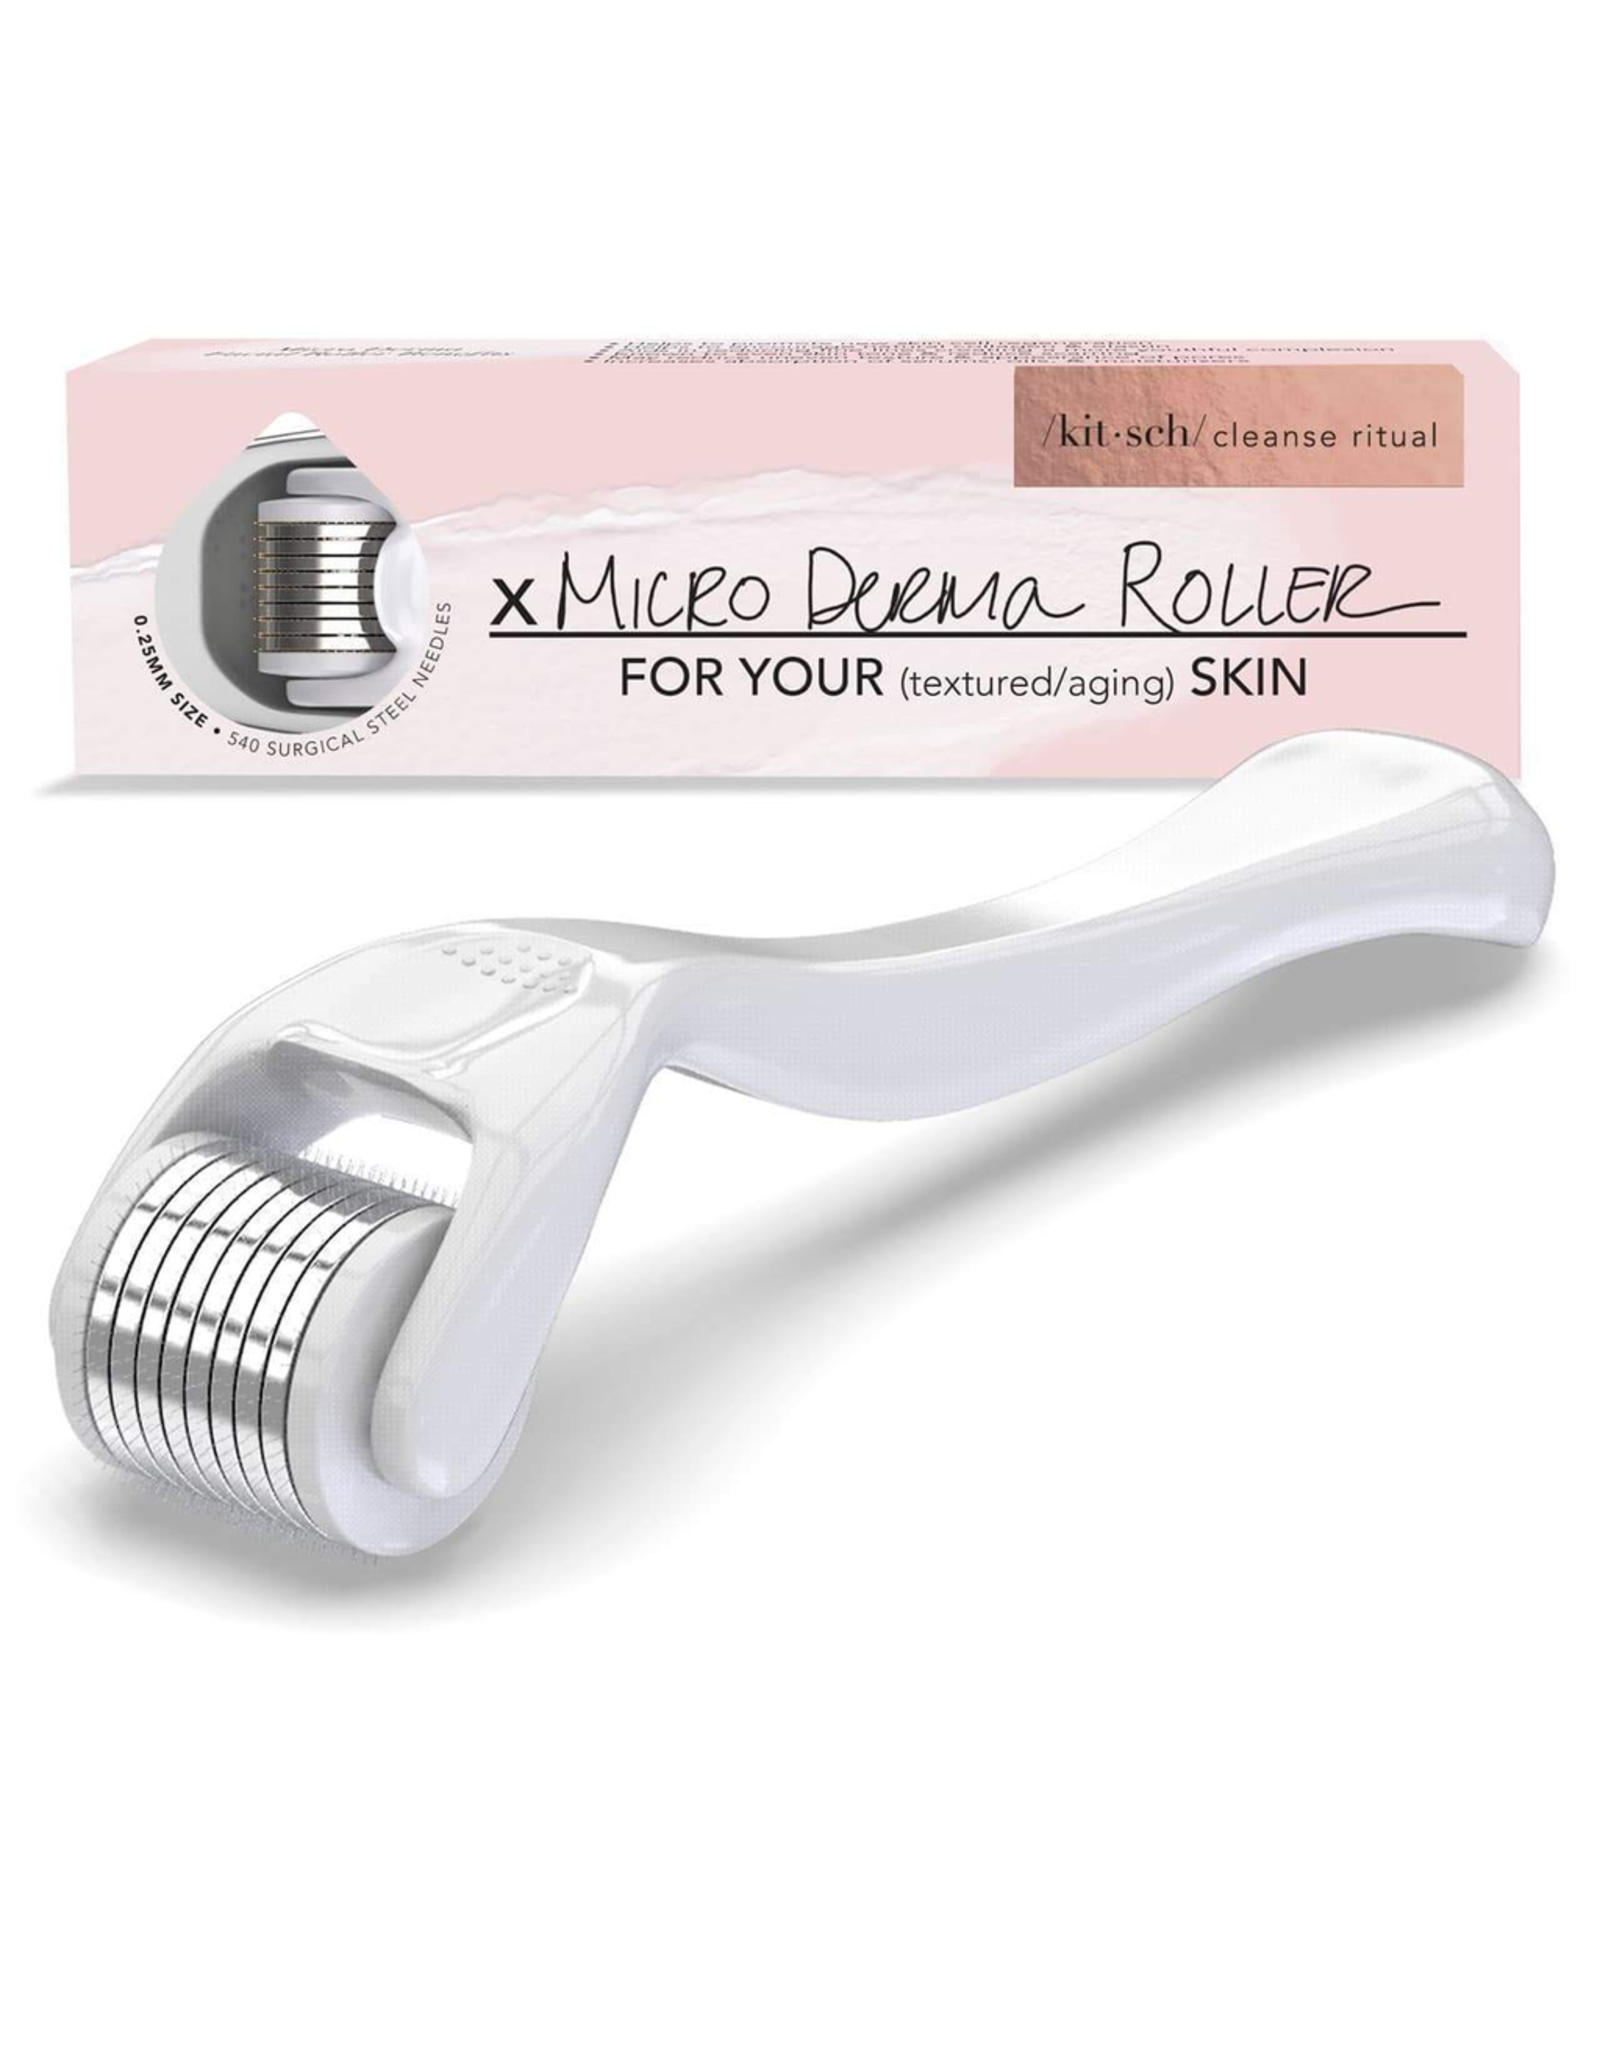 flight lux micro derma roller